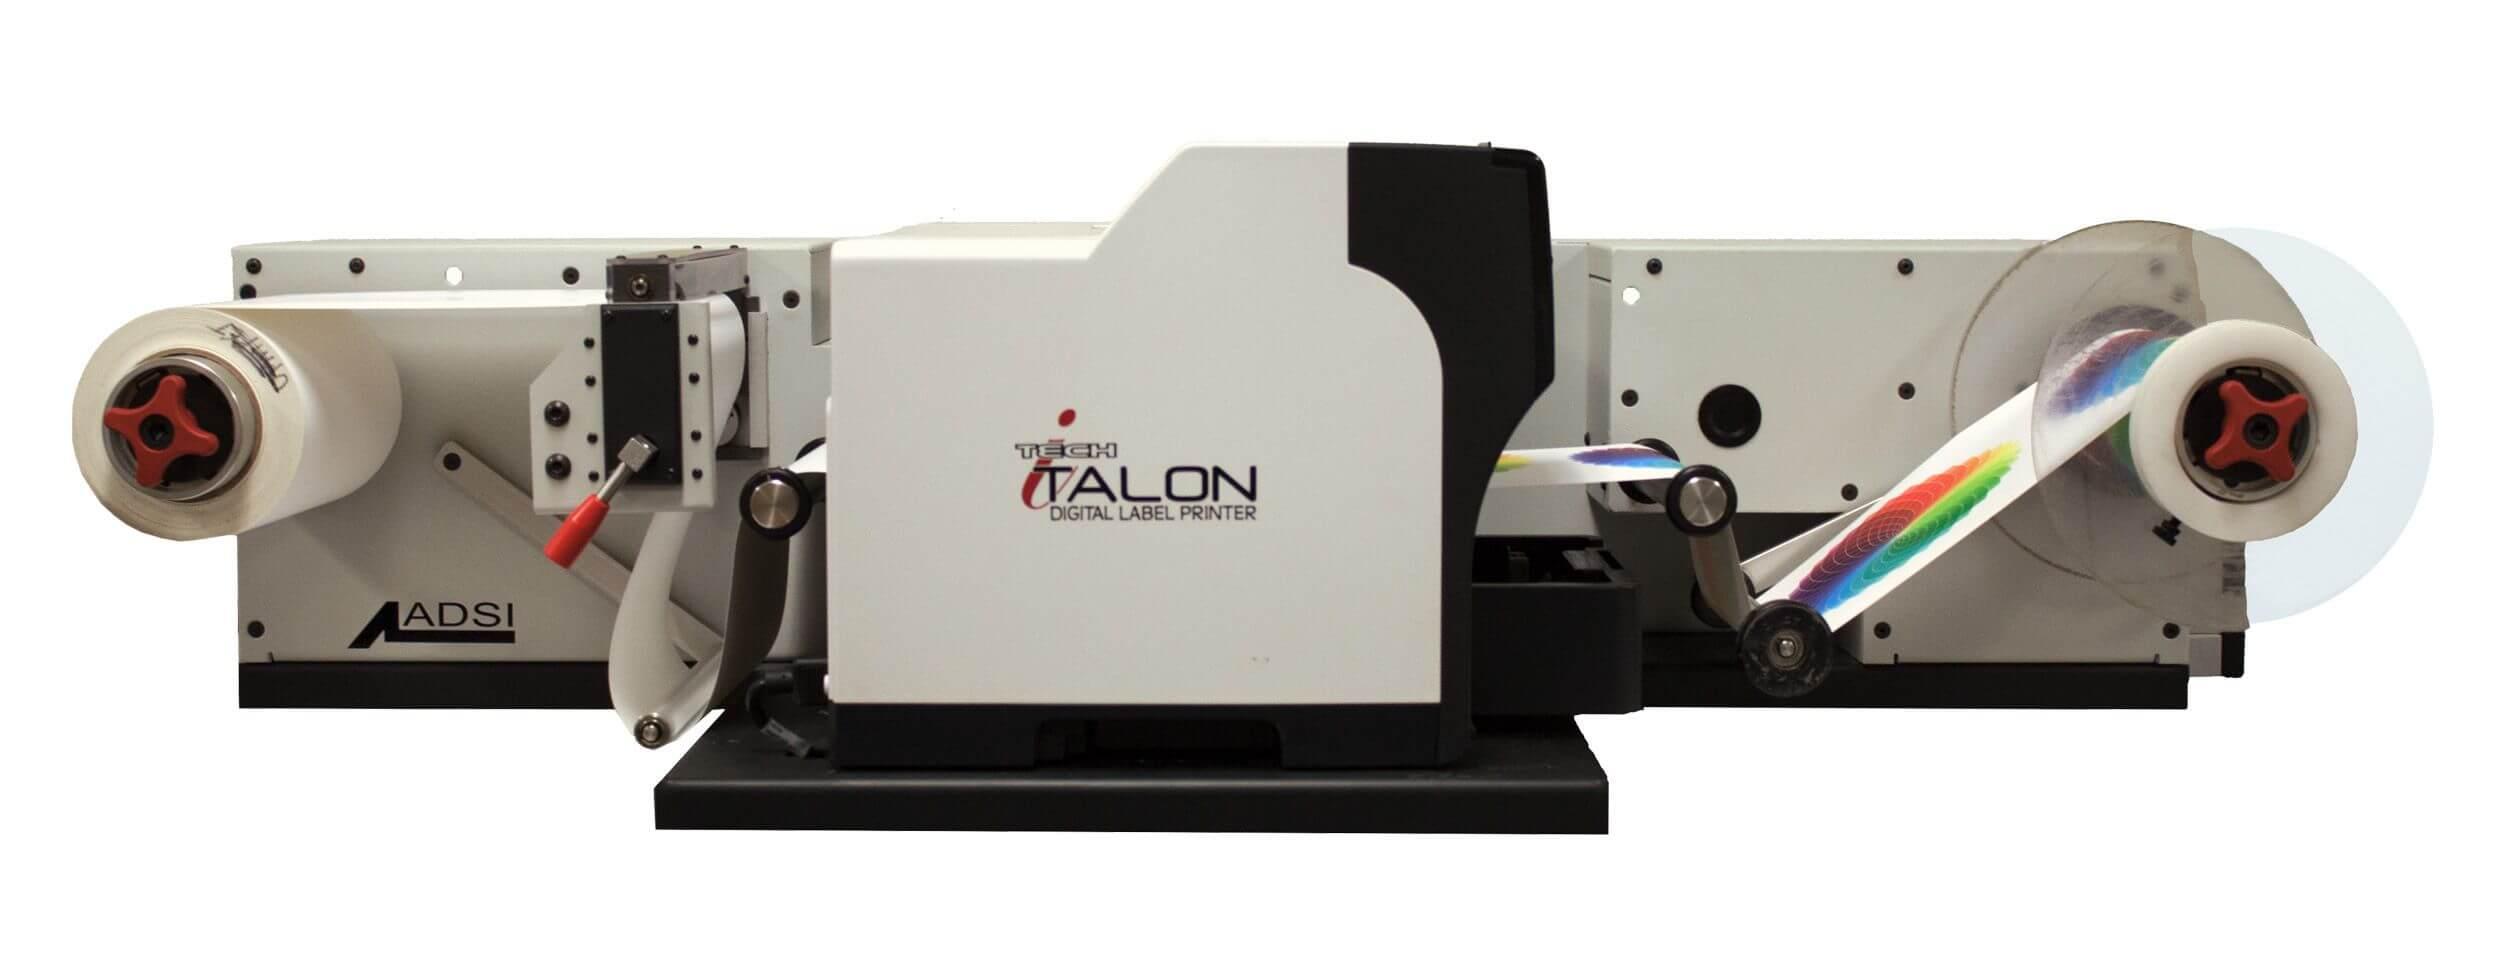 NTG-Talon Printer